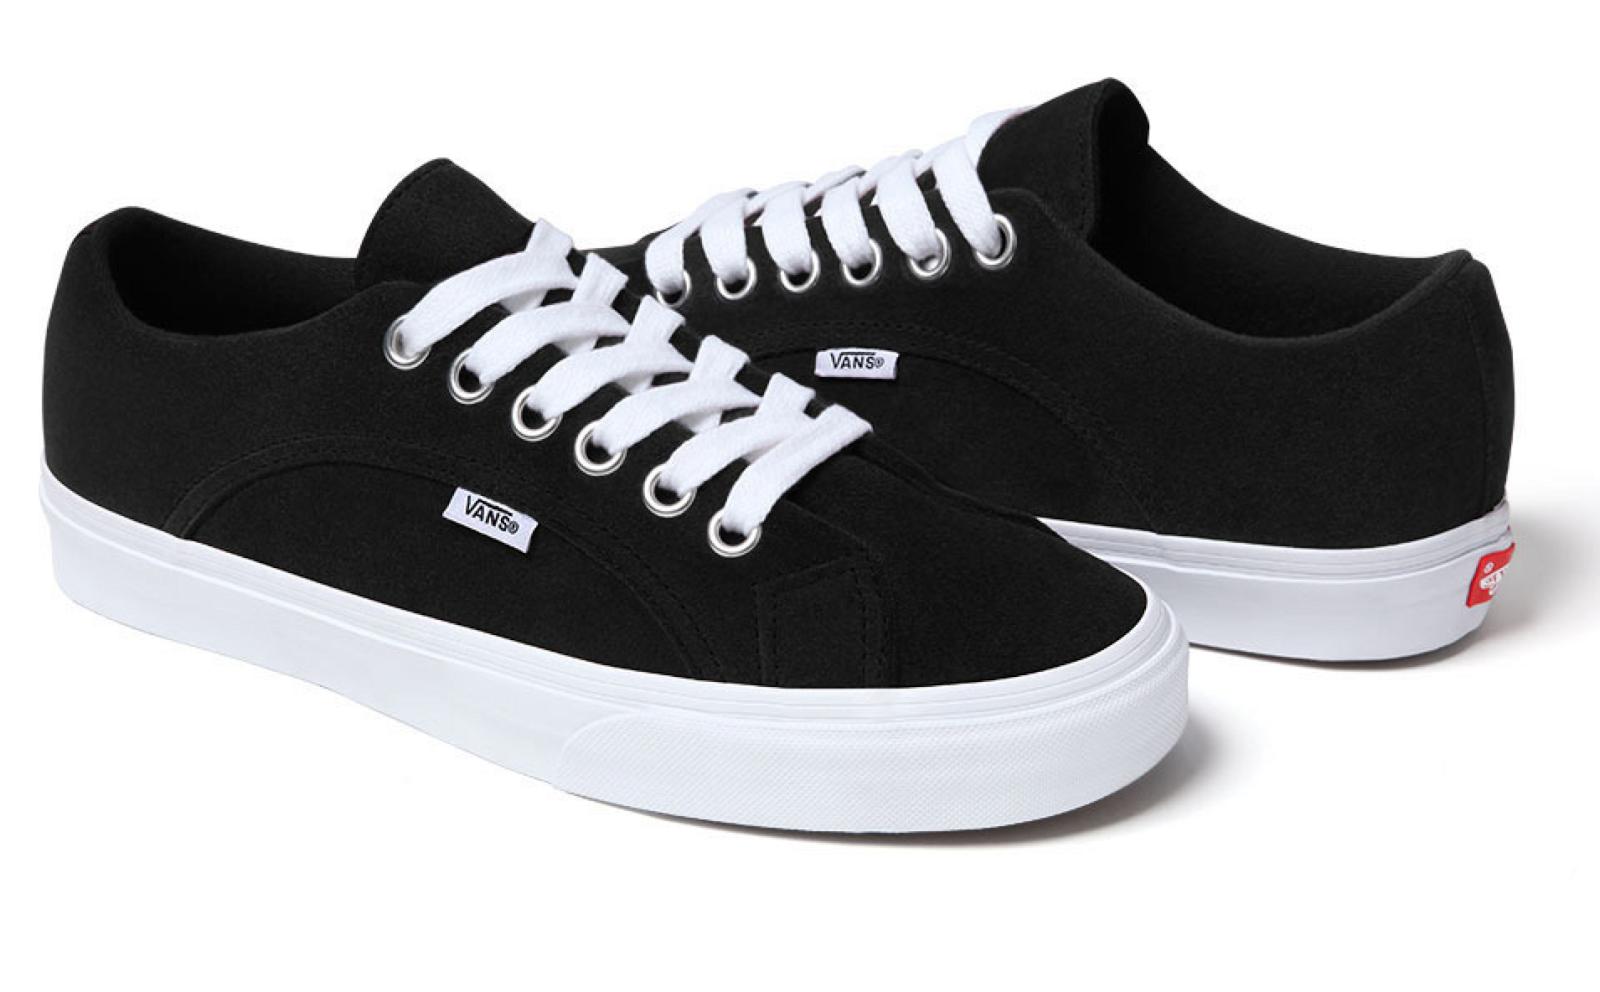 supreme x vans lin sneaker release solifestyle